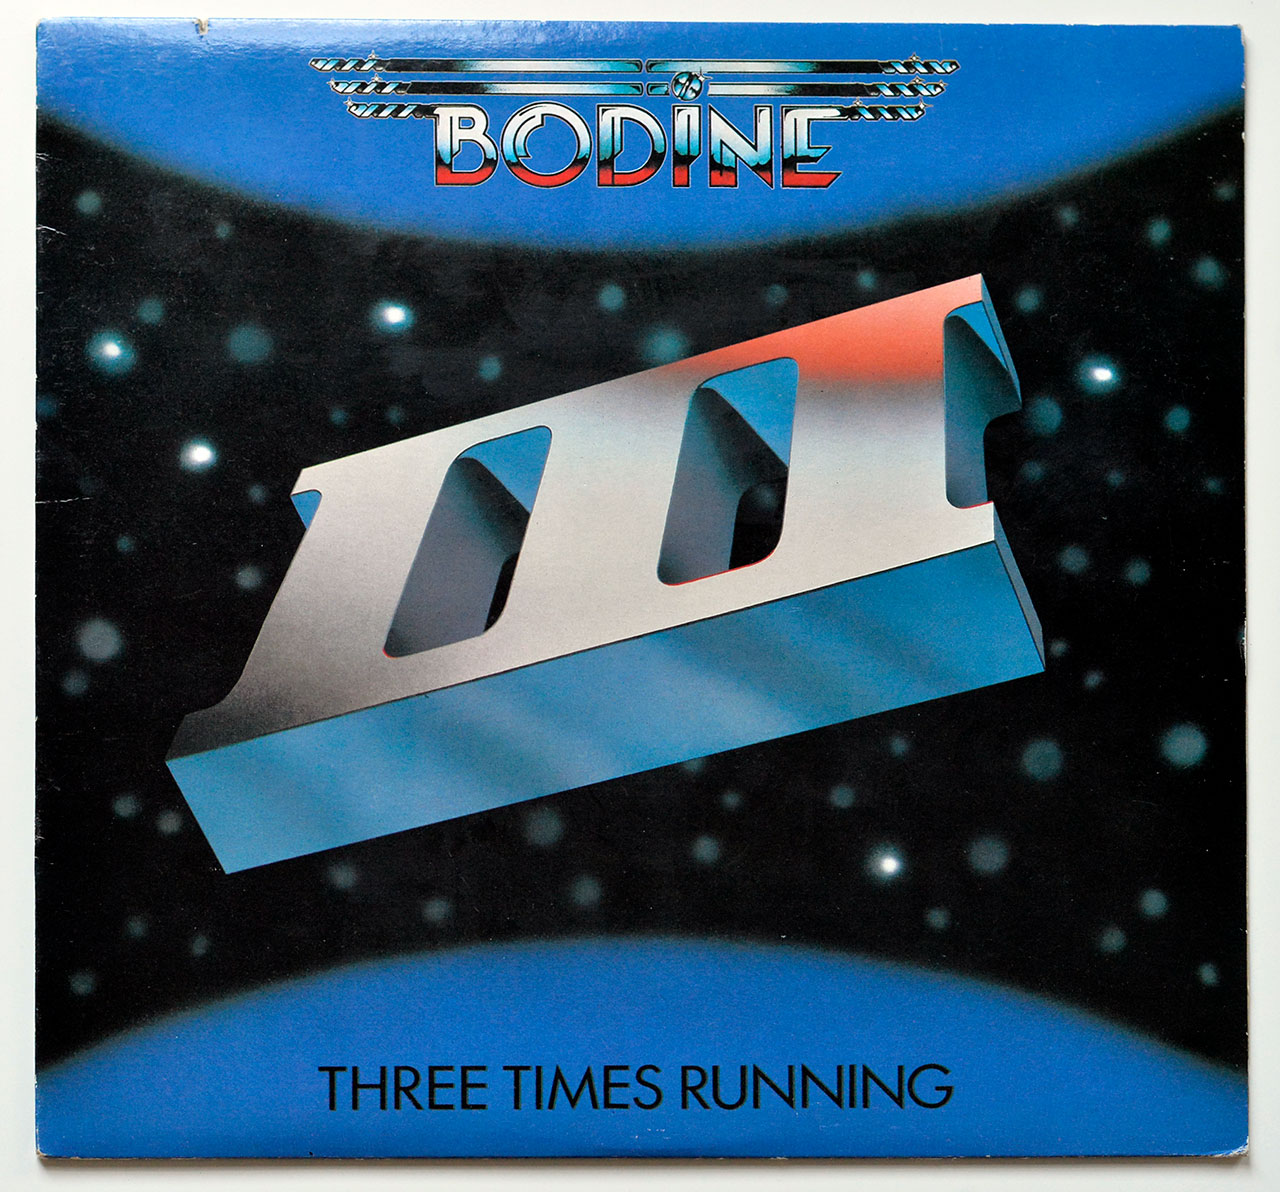 A0721 BODINE Three Times Running